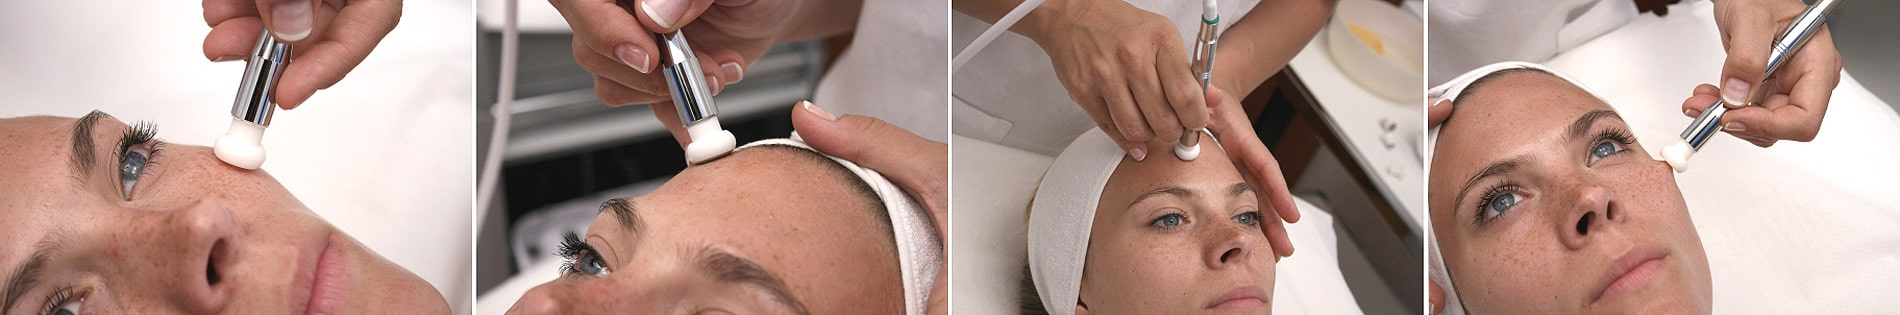 Professionelles Peeling mit der Diamant-Dermabrasion